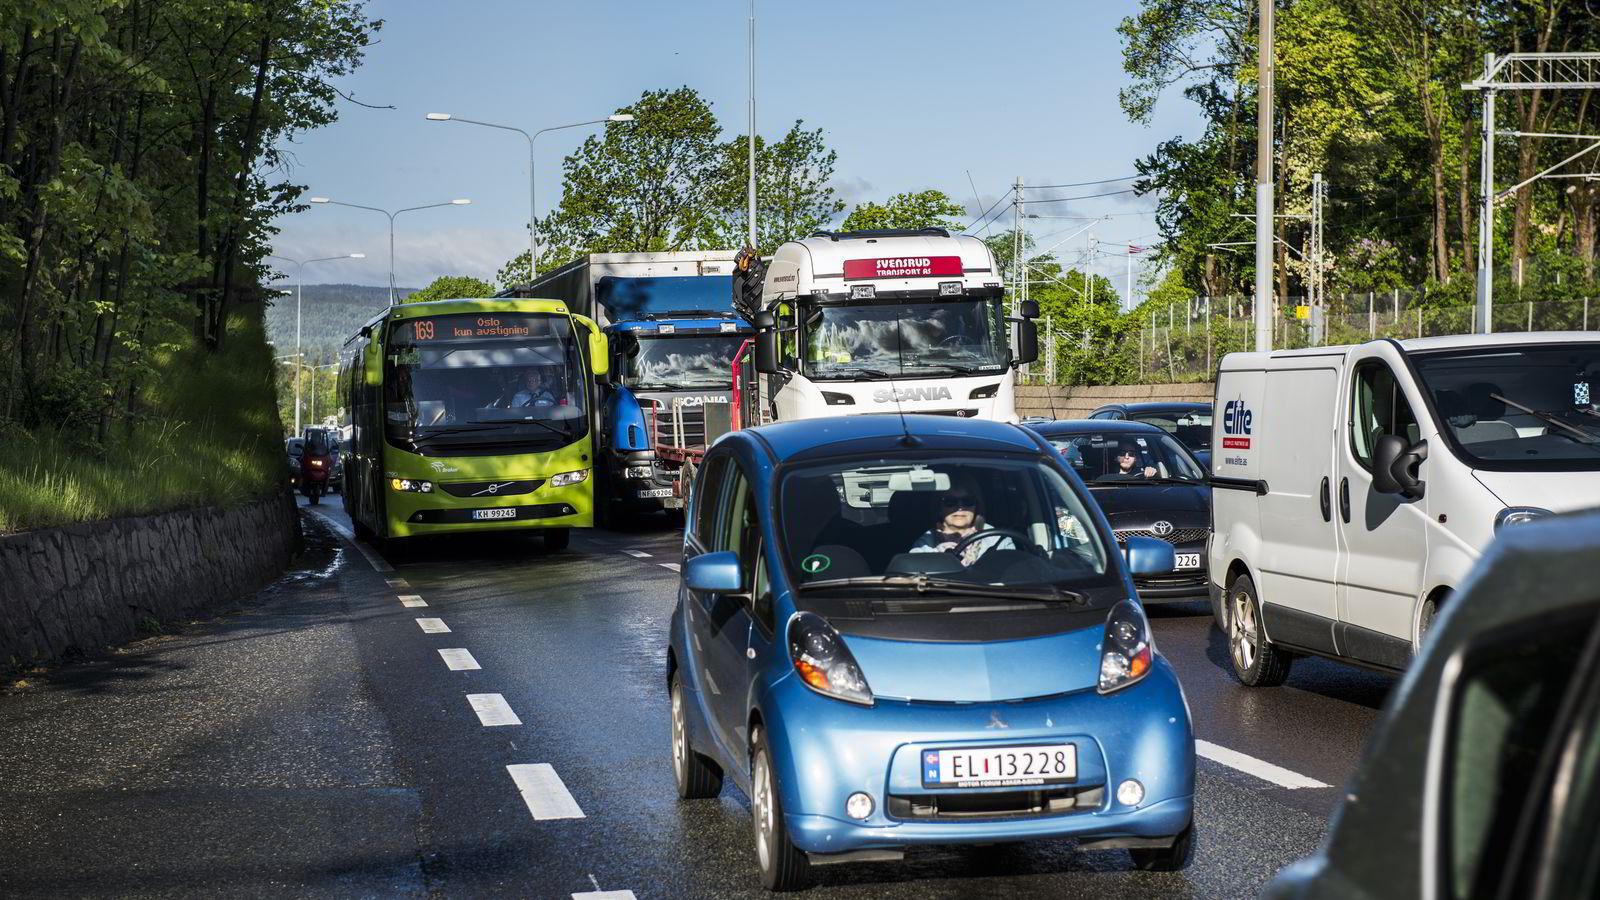 KAOS. Slik blir trafikken fremover. Foto: Klaudia lech